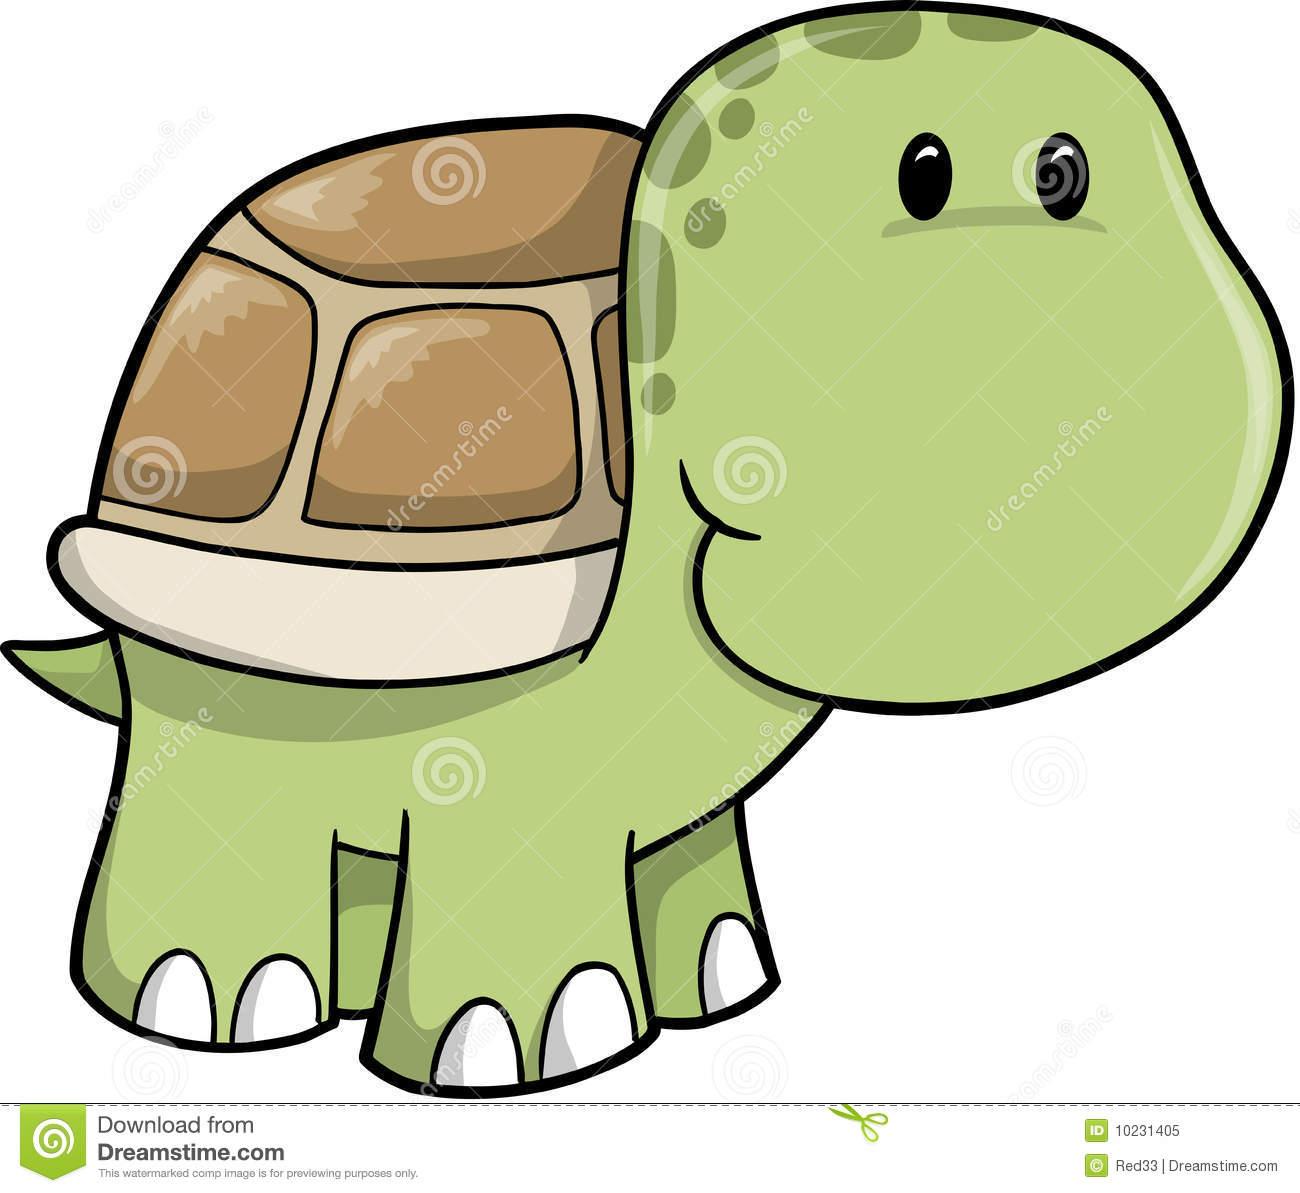 cute turtle clip art clipart panda free clipart images rh clipartpanda com cute baby turtle clipart cute turtle pictures clip art